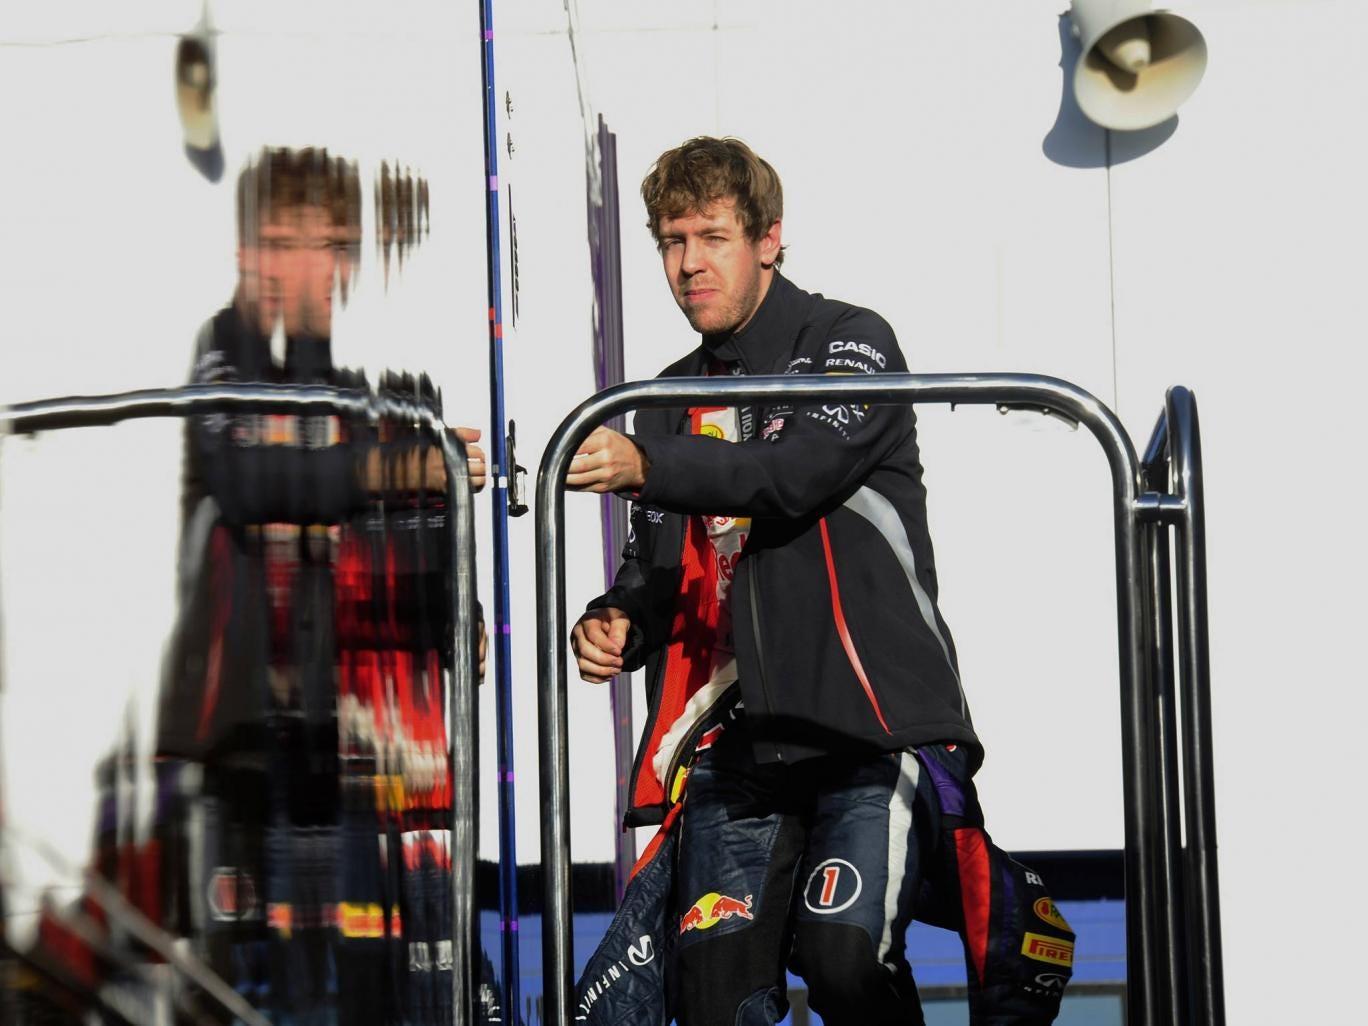 Red Bull driver Sebastian Vettel at pre-season testing